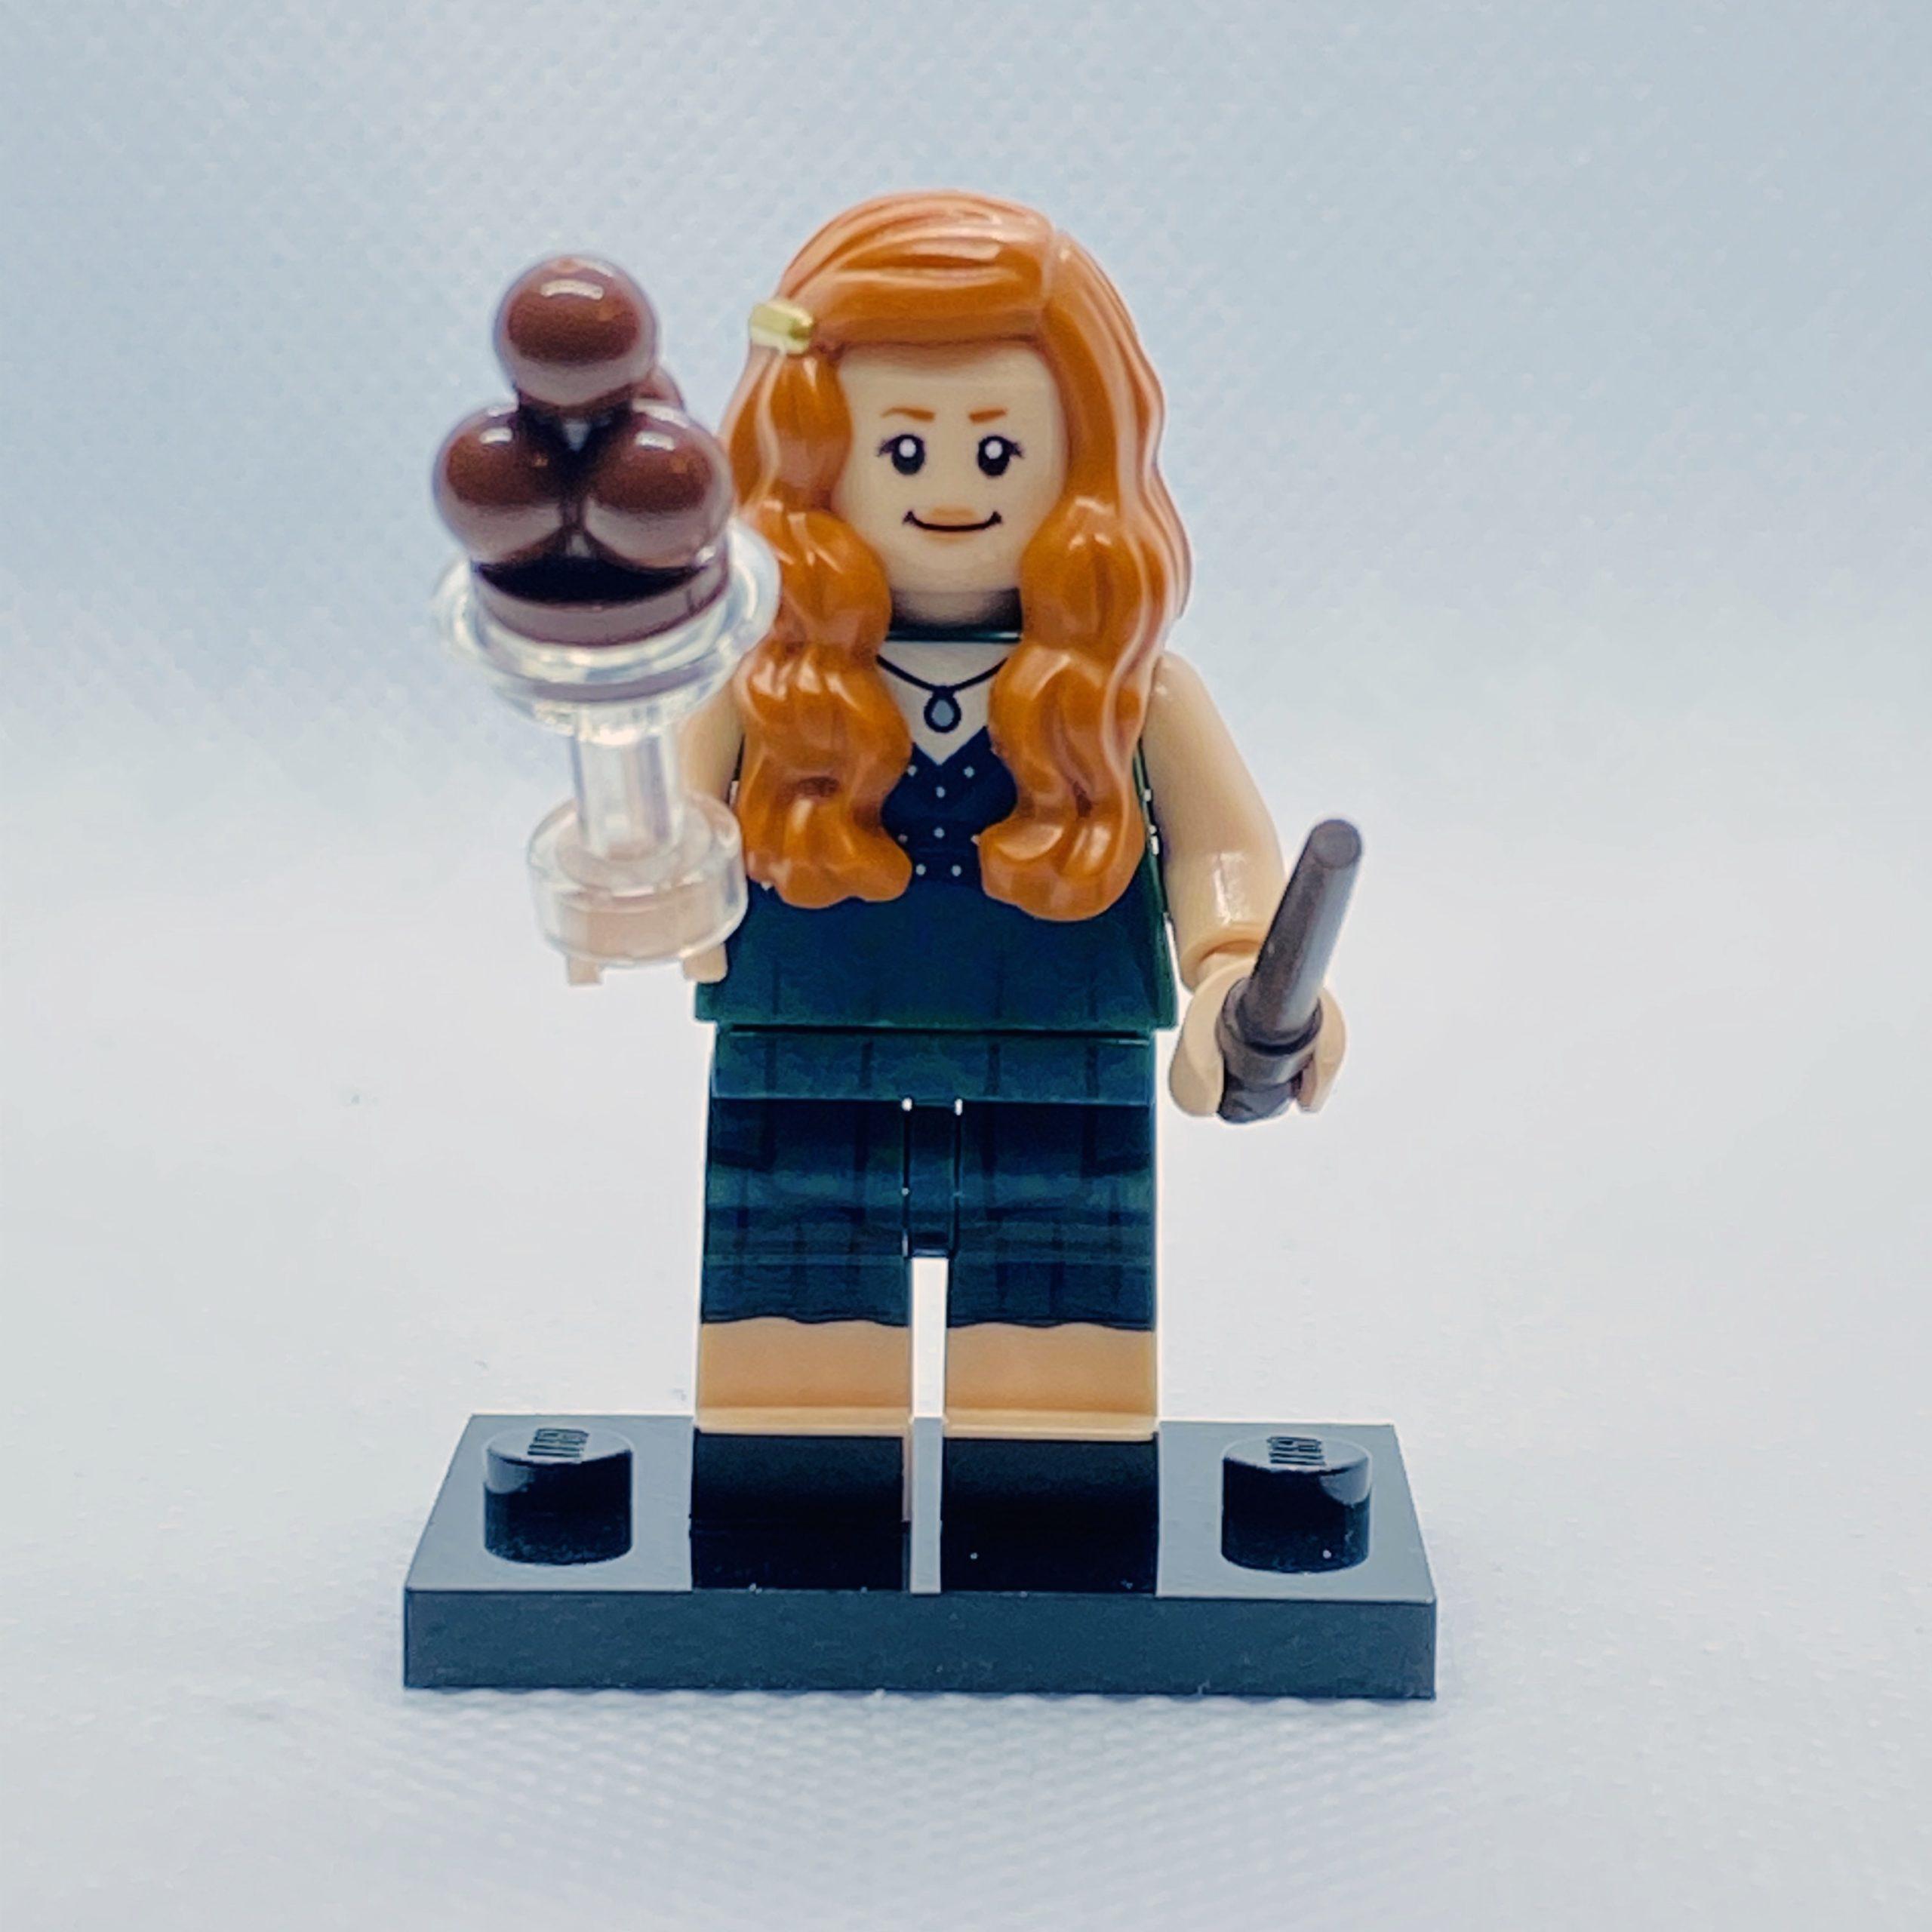 LEGO 71028 Ginny Weasley Minifigures n° 9 SERIE Harry Potter 2